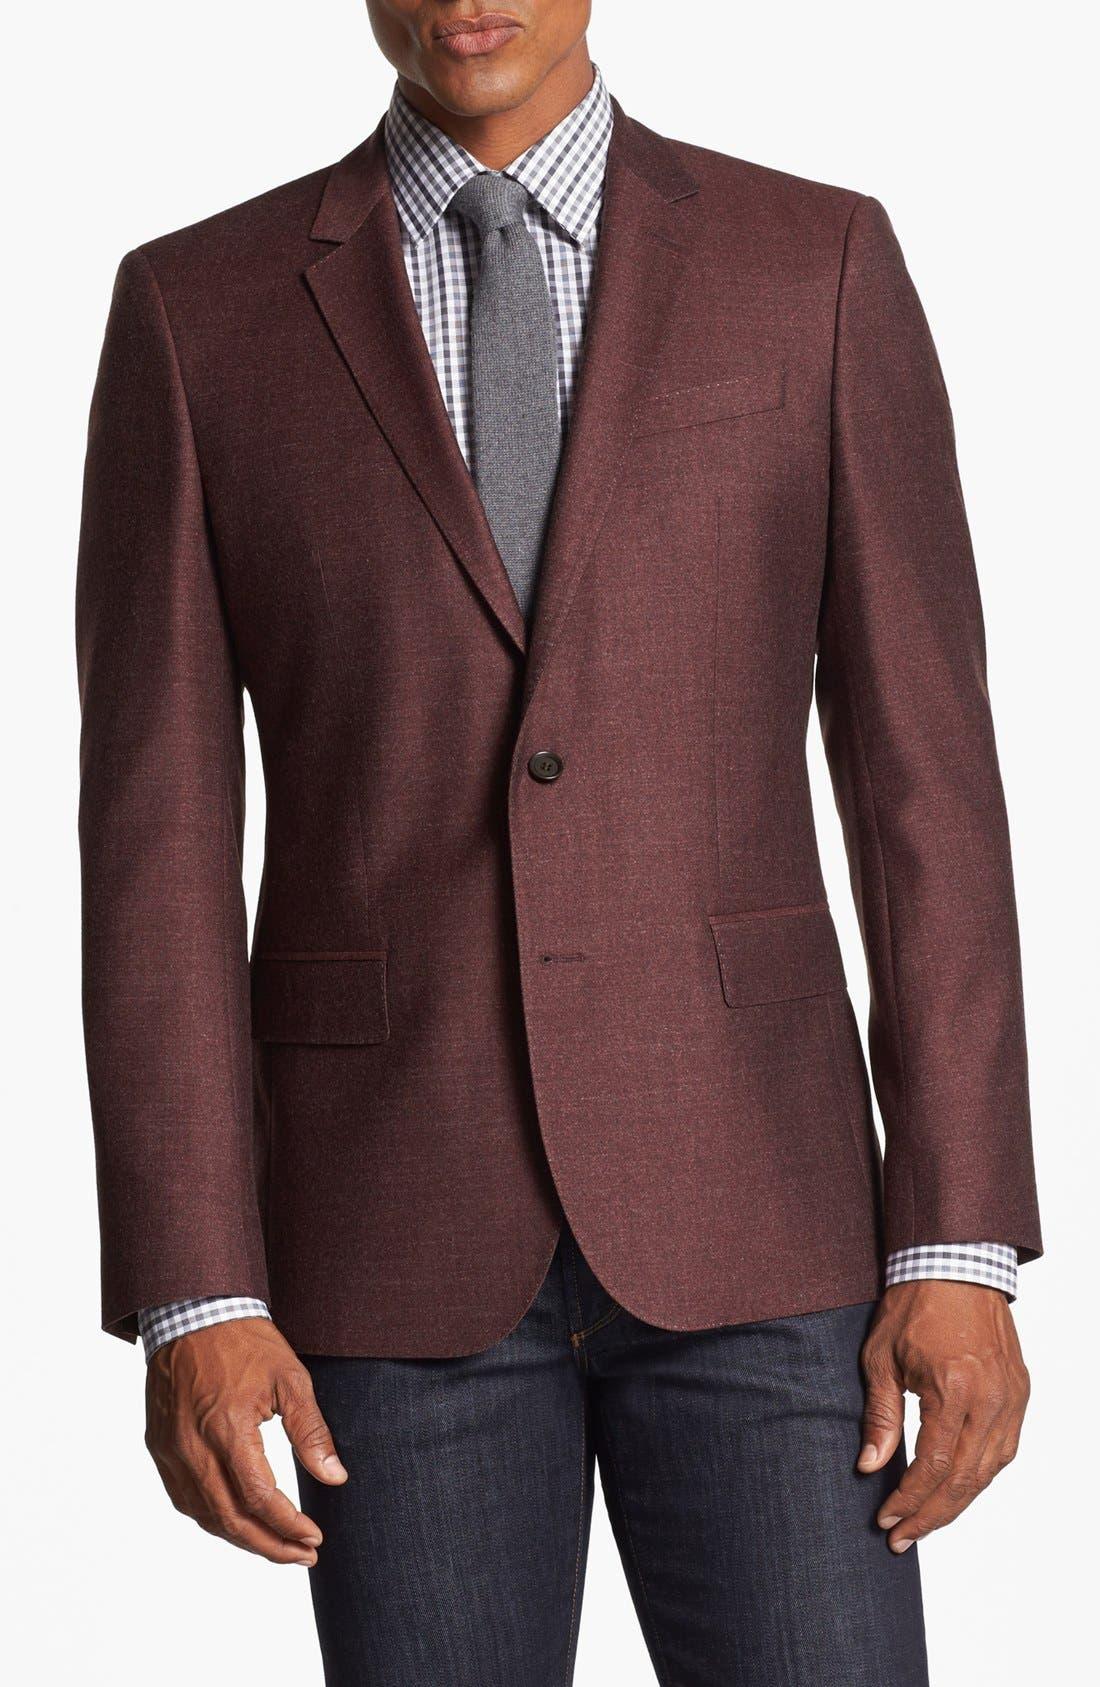 Main Image - BOSS HUGO BOSS 'Hutch' Trim Fit Wool Blazer